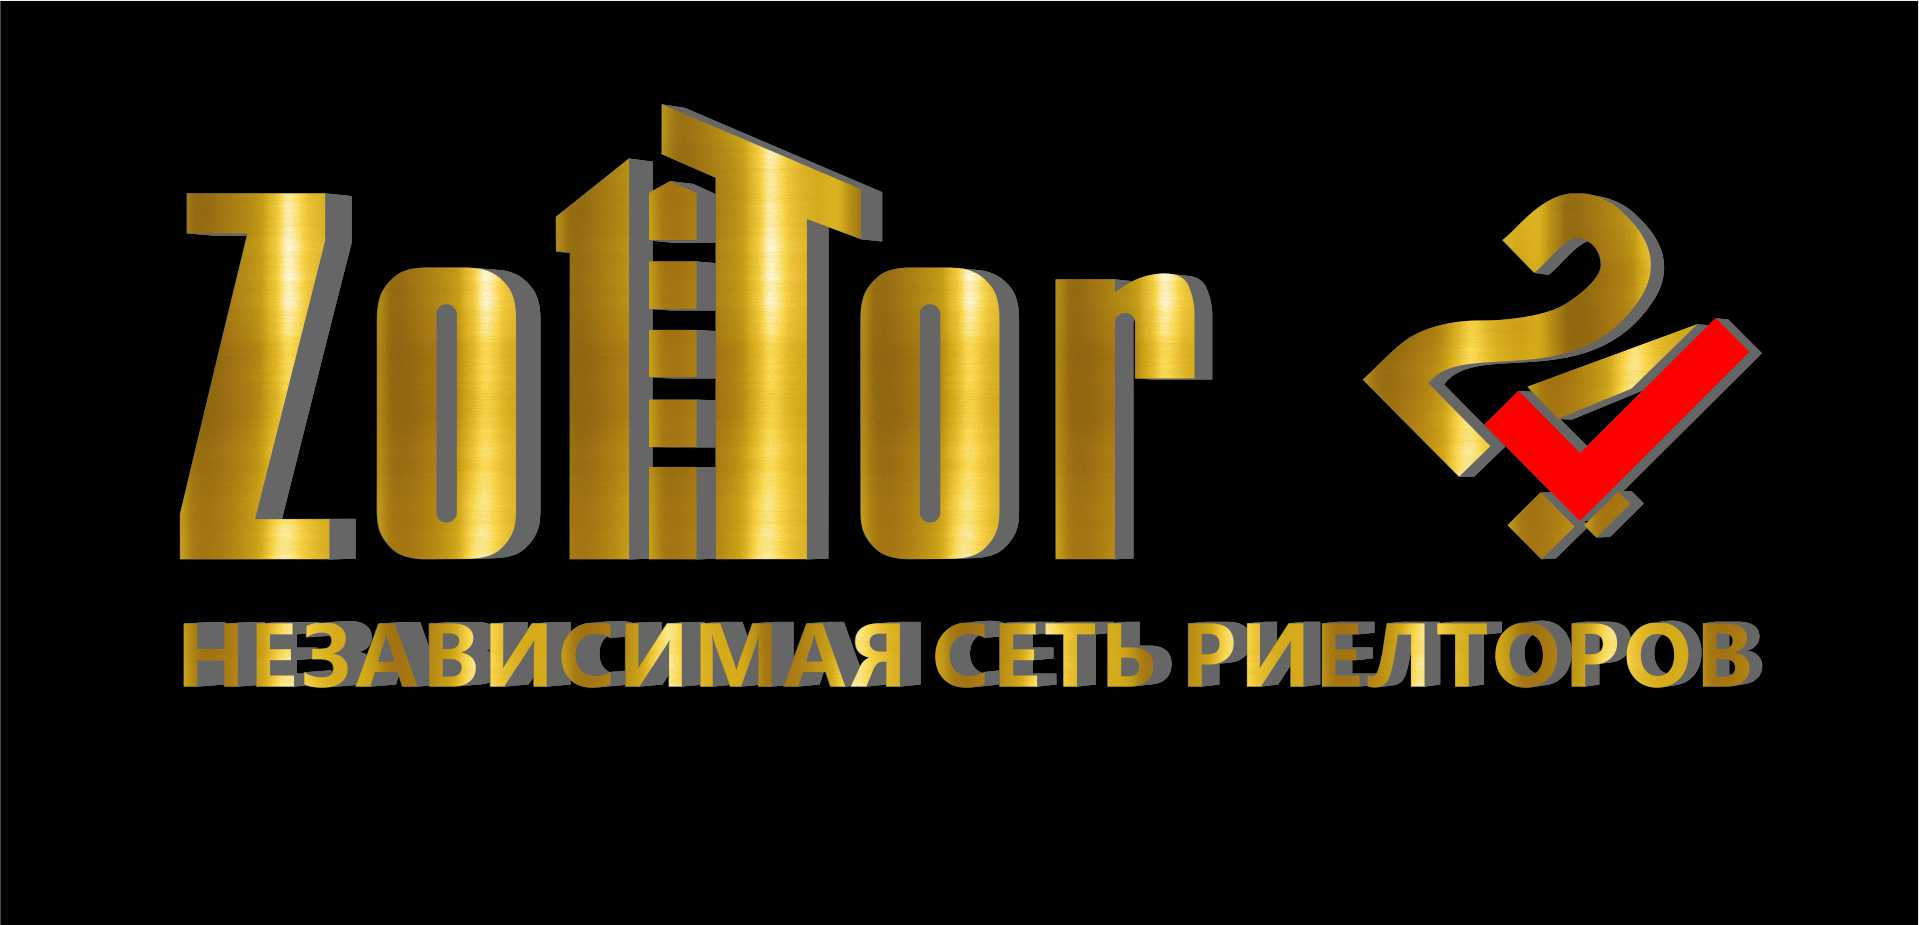 Логотип и фирменный стиль ZolTor24 фото f_5705c8b7da95c5a7.jpg